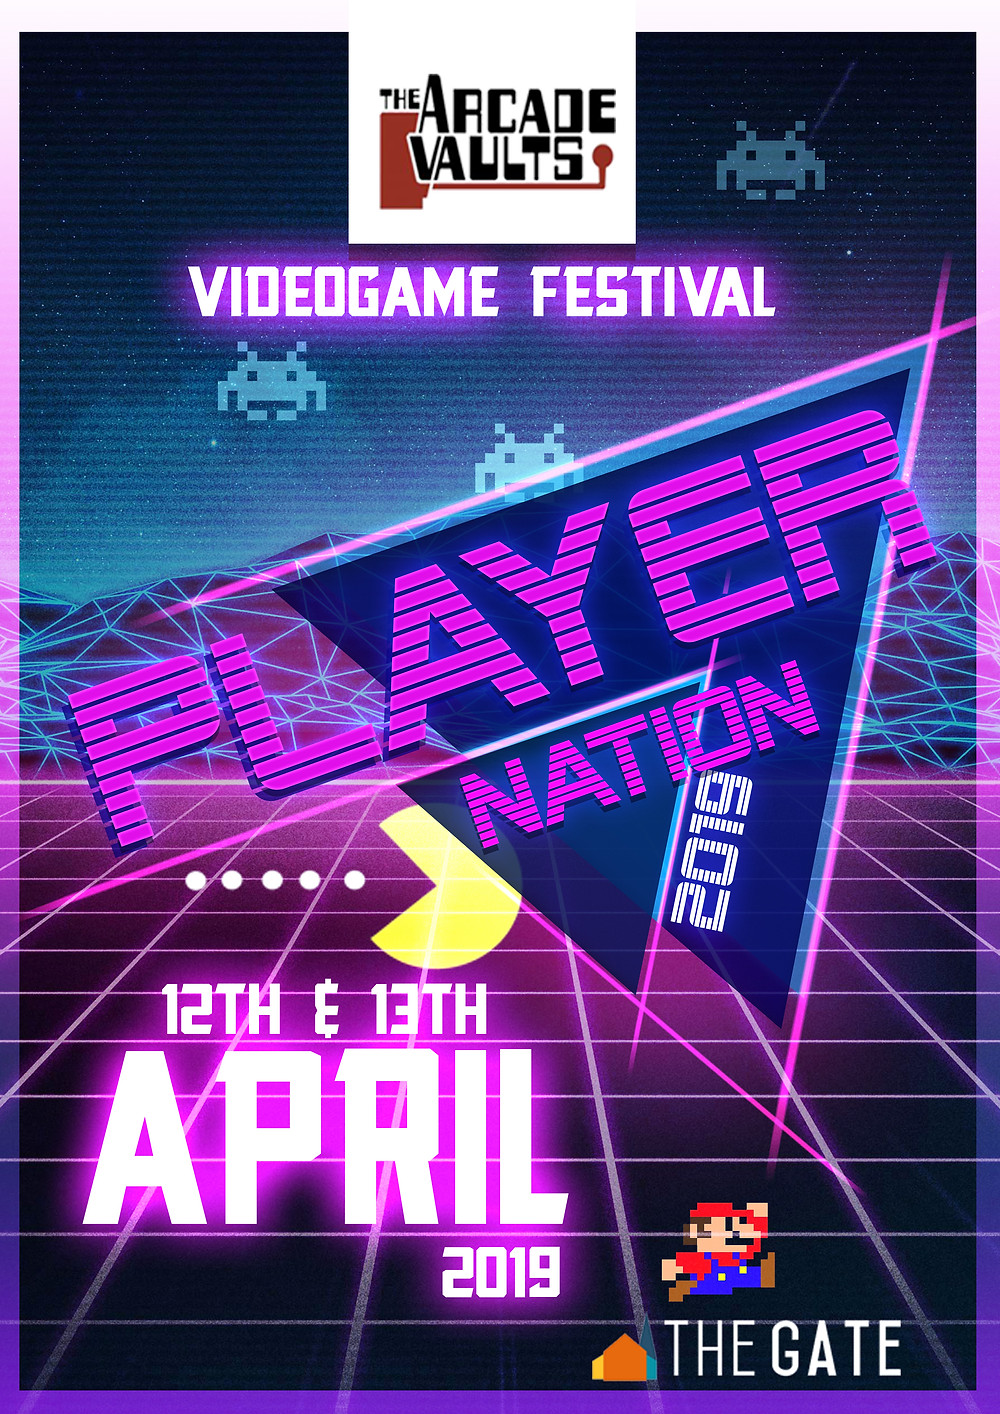 Graphic Design in 2019 for Videogame Festival in Cardiff